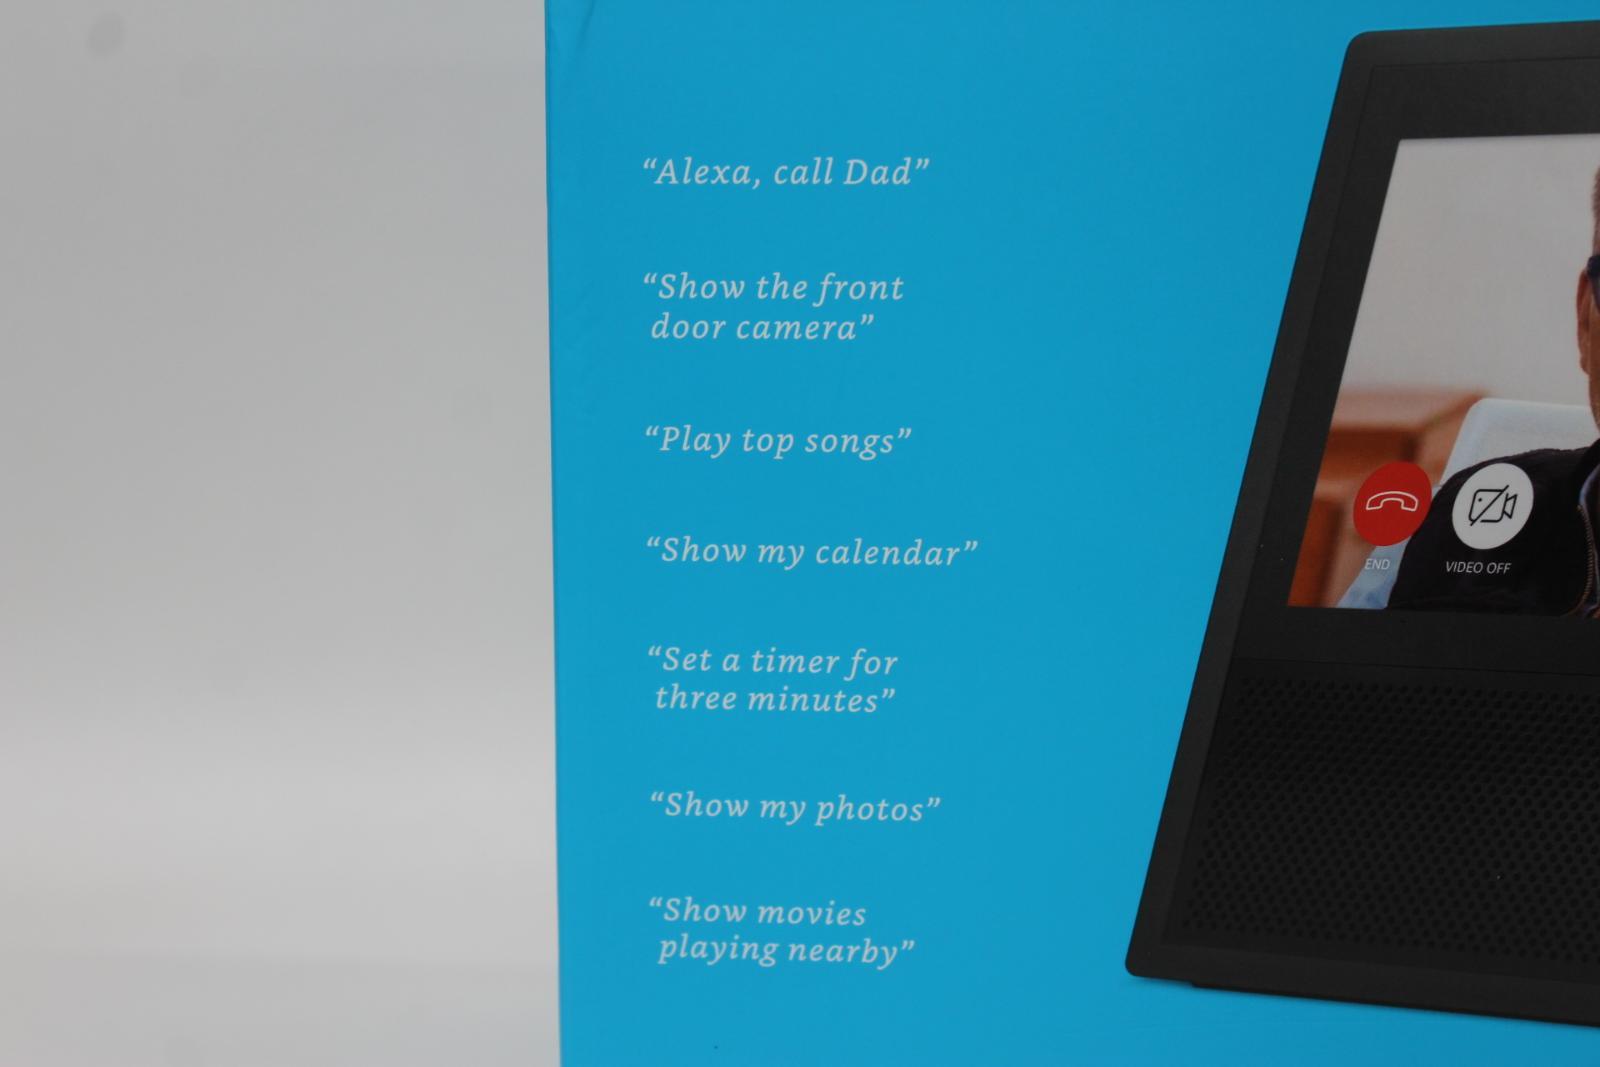 AMAZON-Echo-Show-Alexa-Smart-Assistant-Black-1st-Generation-7-034-Display-NEW thumbnail 3